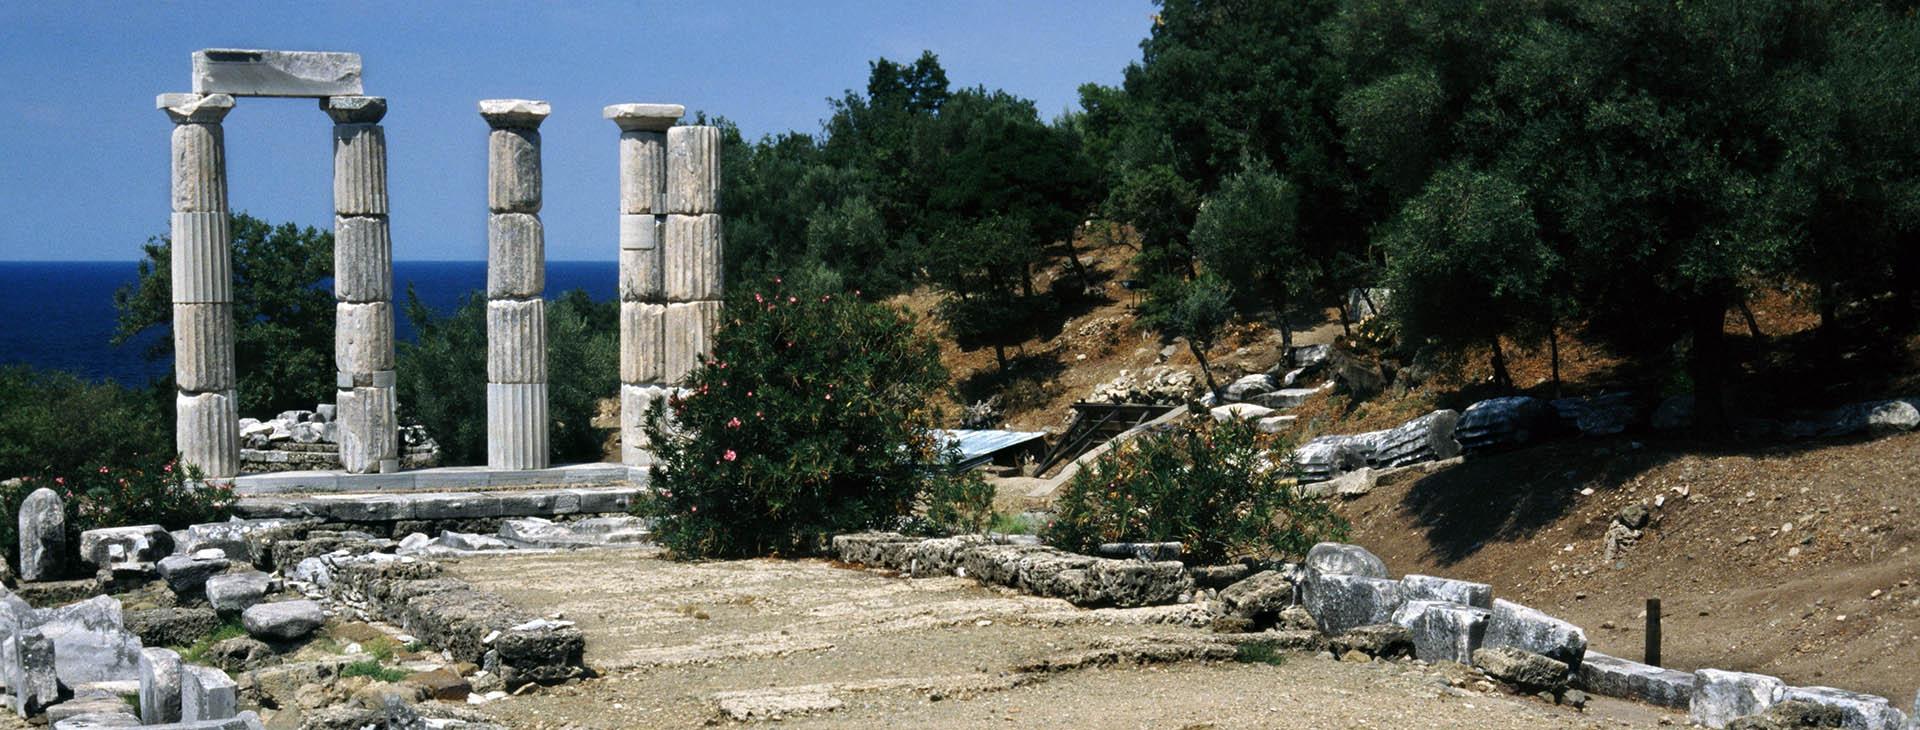 Sanctuary of the Great Gods, Palaiopolis, Samothrace island